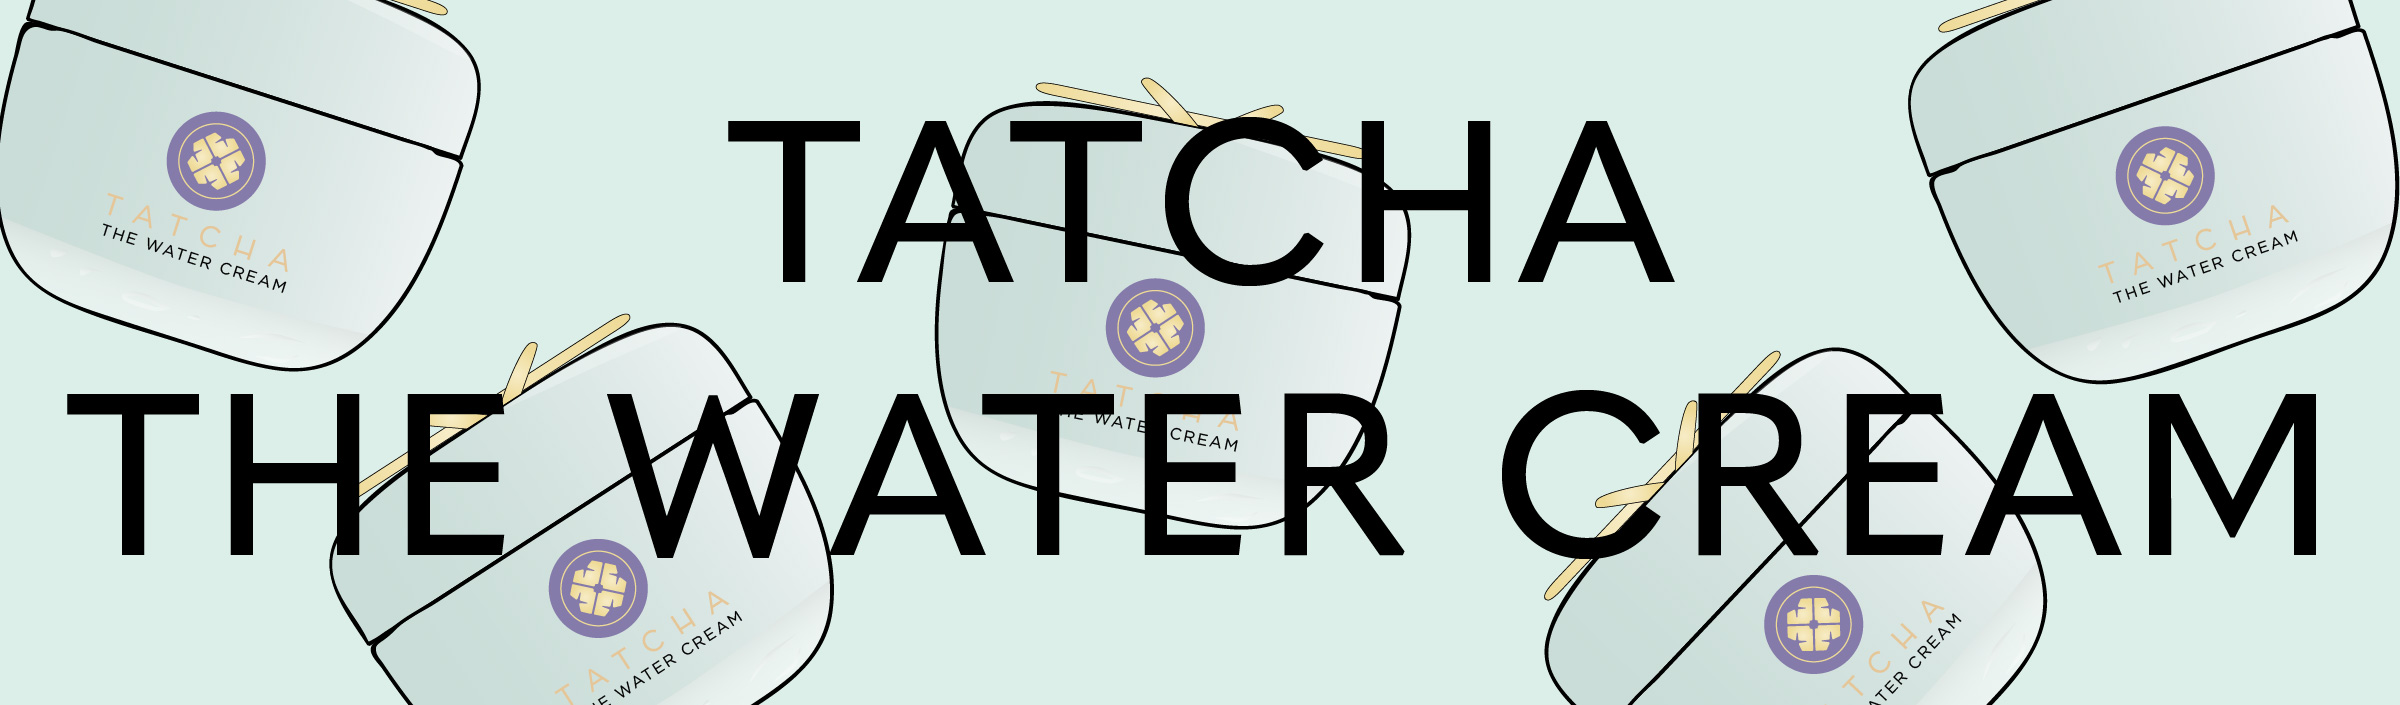 Tatcha the Water Cream Review.jpg